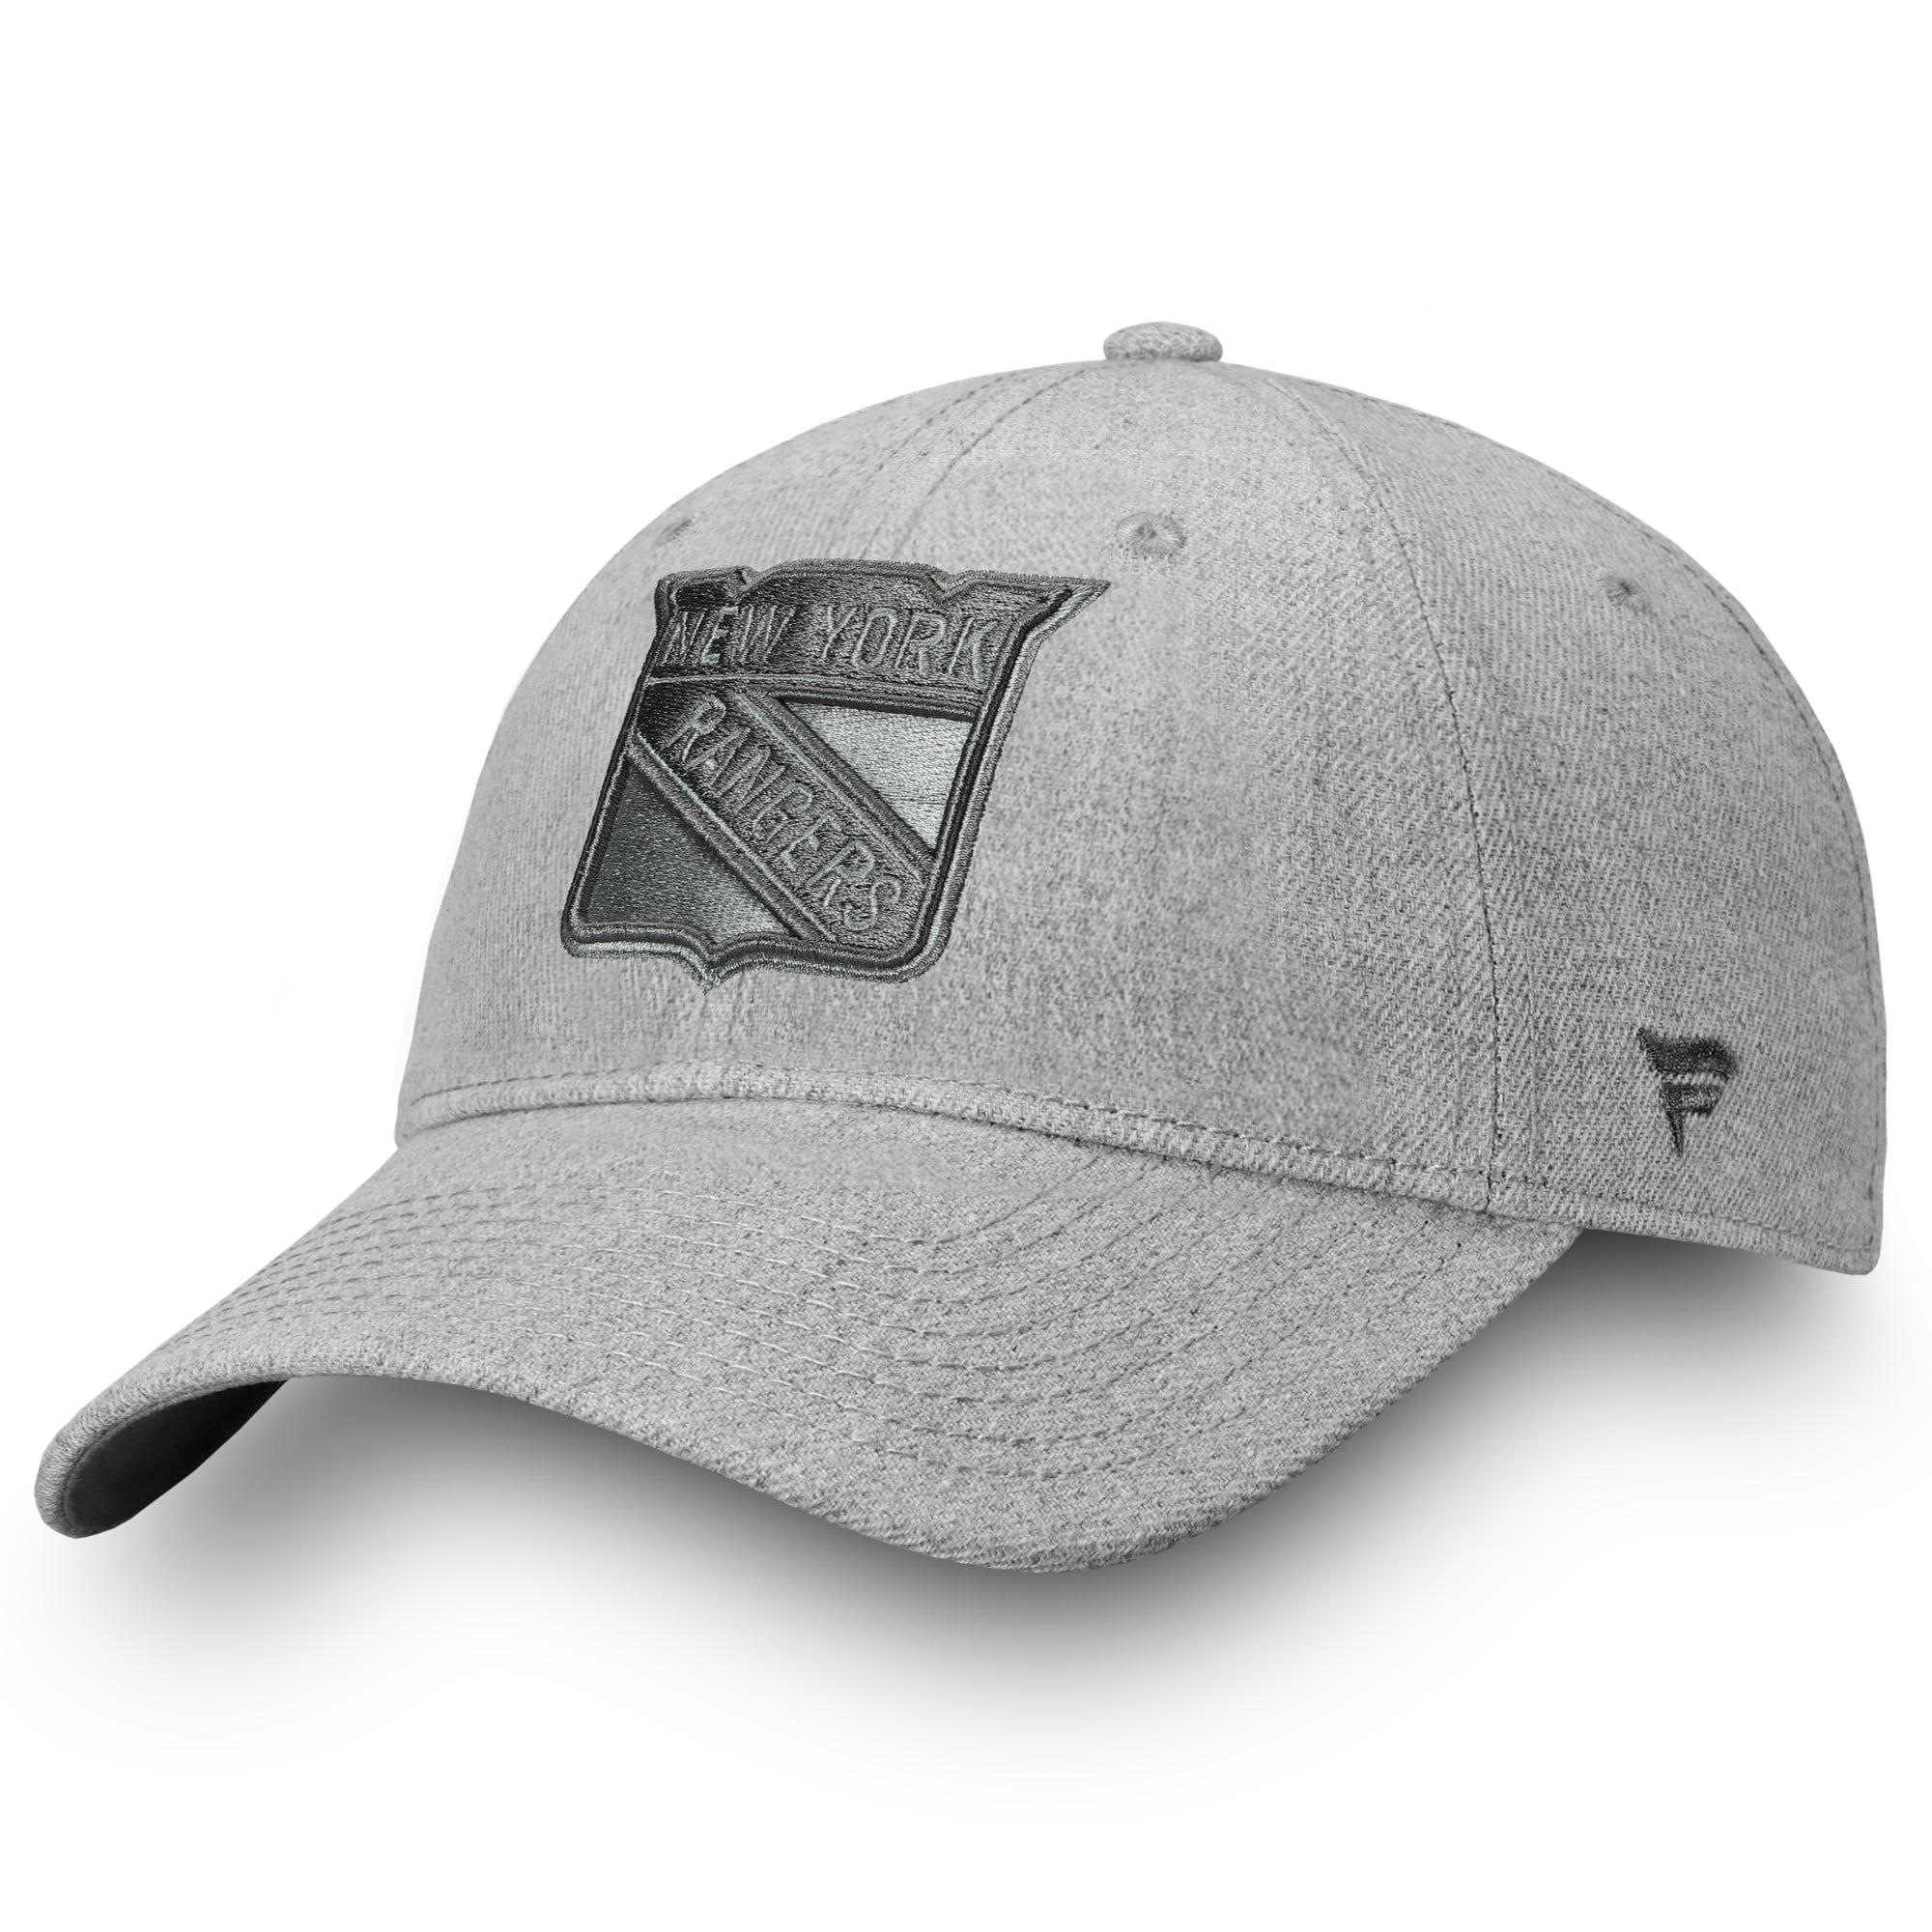 cheap for discount 23779 6674e ... greece buy new york rangers fanatics branded team haze adjustable  snapback hat gray osfa 1dc0a 95c16